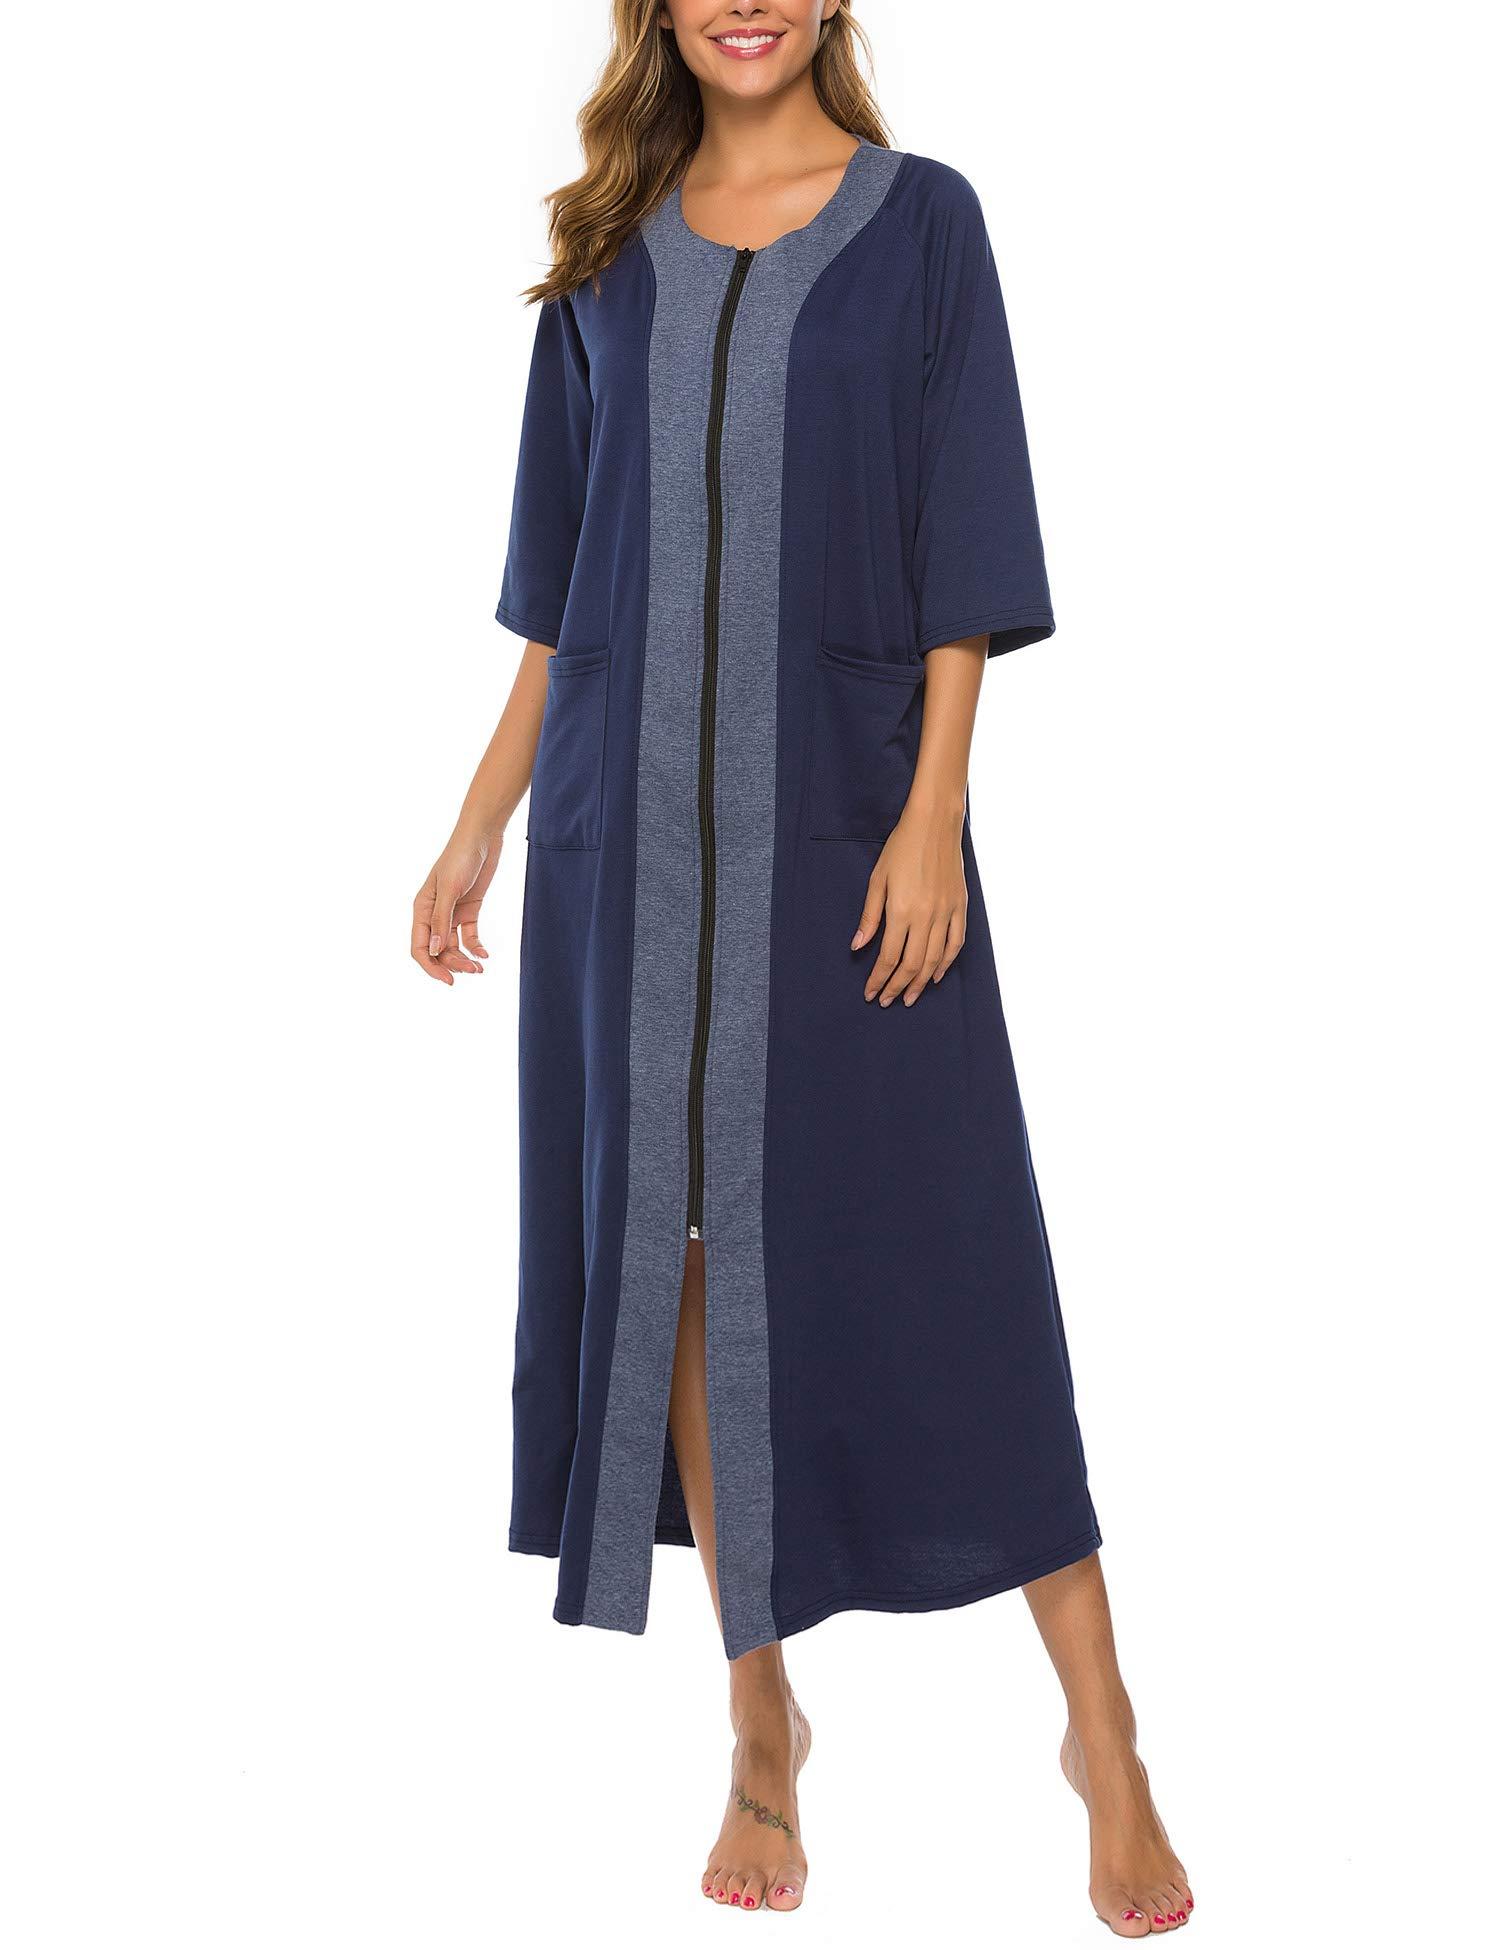 Bloggerlove House Coat Women Zipper Robe Half Sleeve Loungewear Full Length Sleepwear Long Nightgowns with Pockets S-XXL